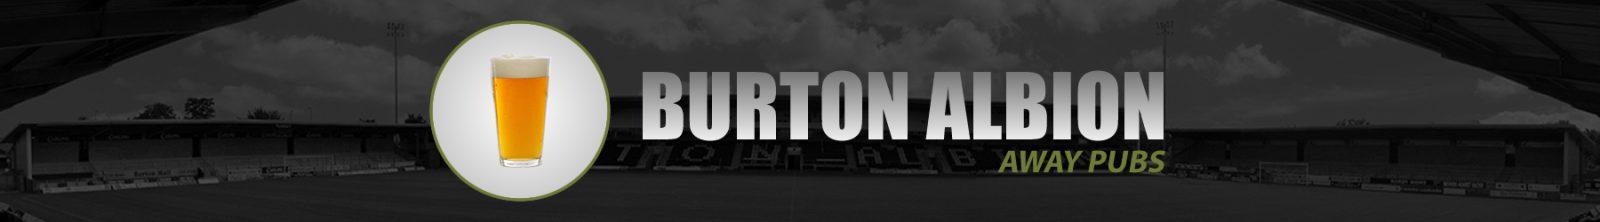 Burton Albion Away Pubs